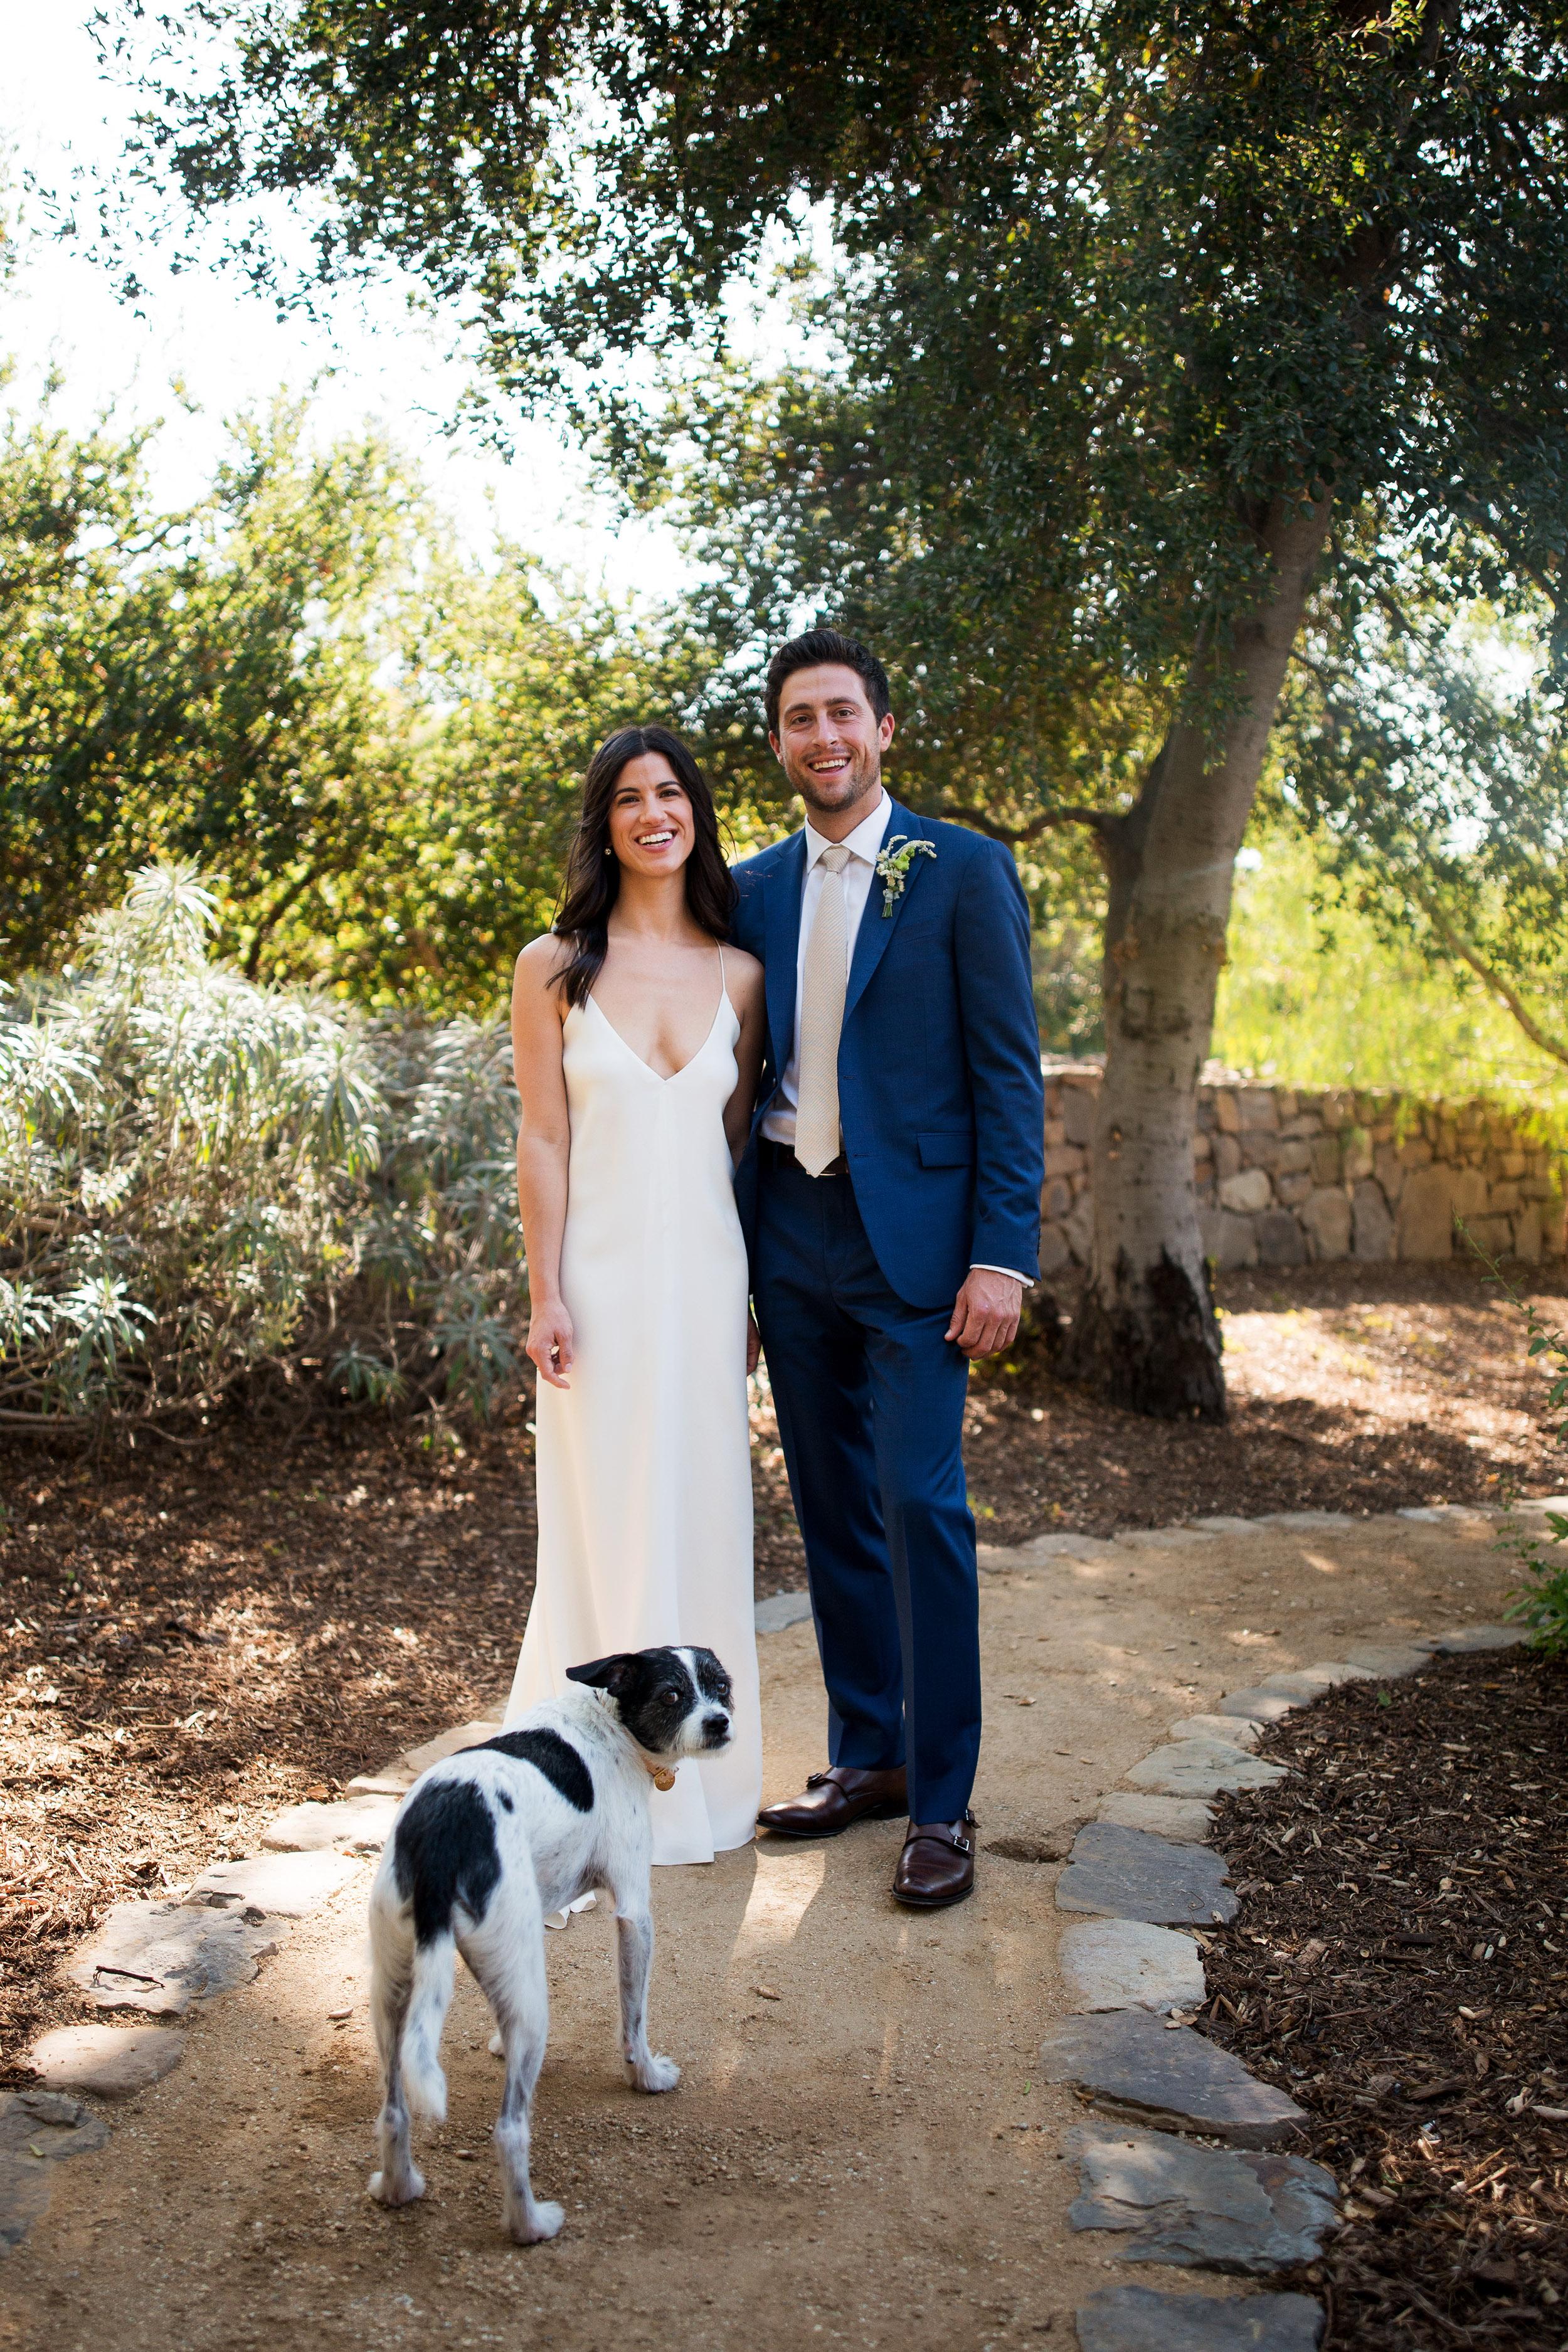 anika max wedding couple with dog